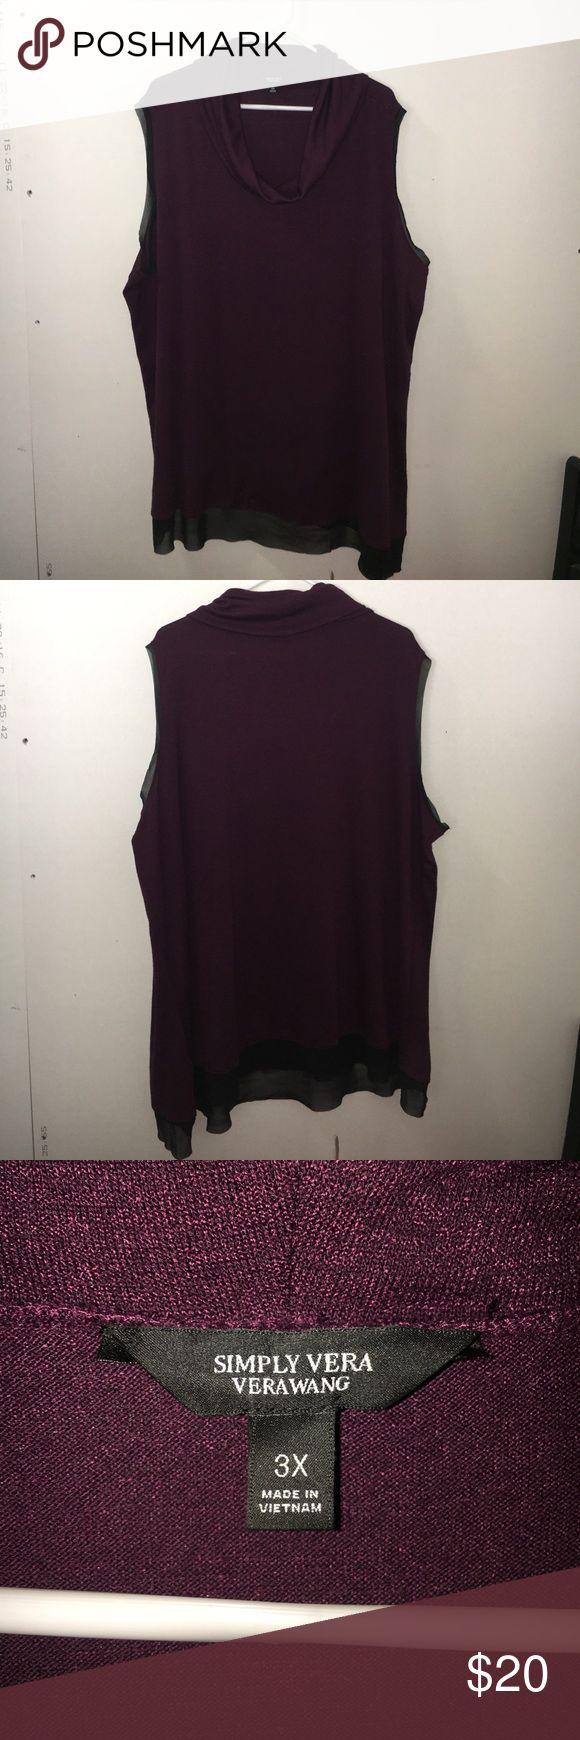 Simply Vera- Vera Wang size 3X purple top Simply Vera- Vera Wang 3x purple sleeveless top. Super cute Simply Vera Vera Wang Tops Tunics